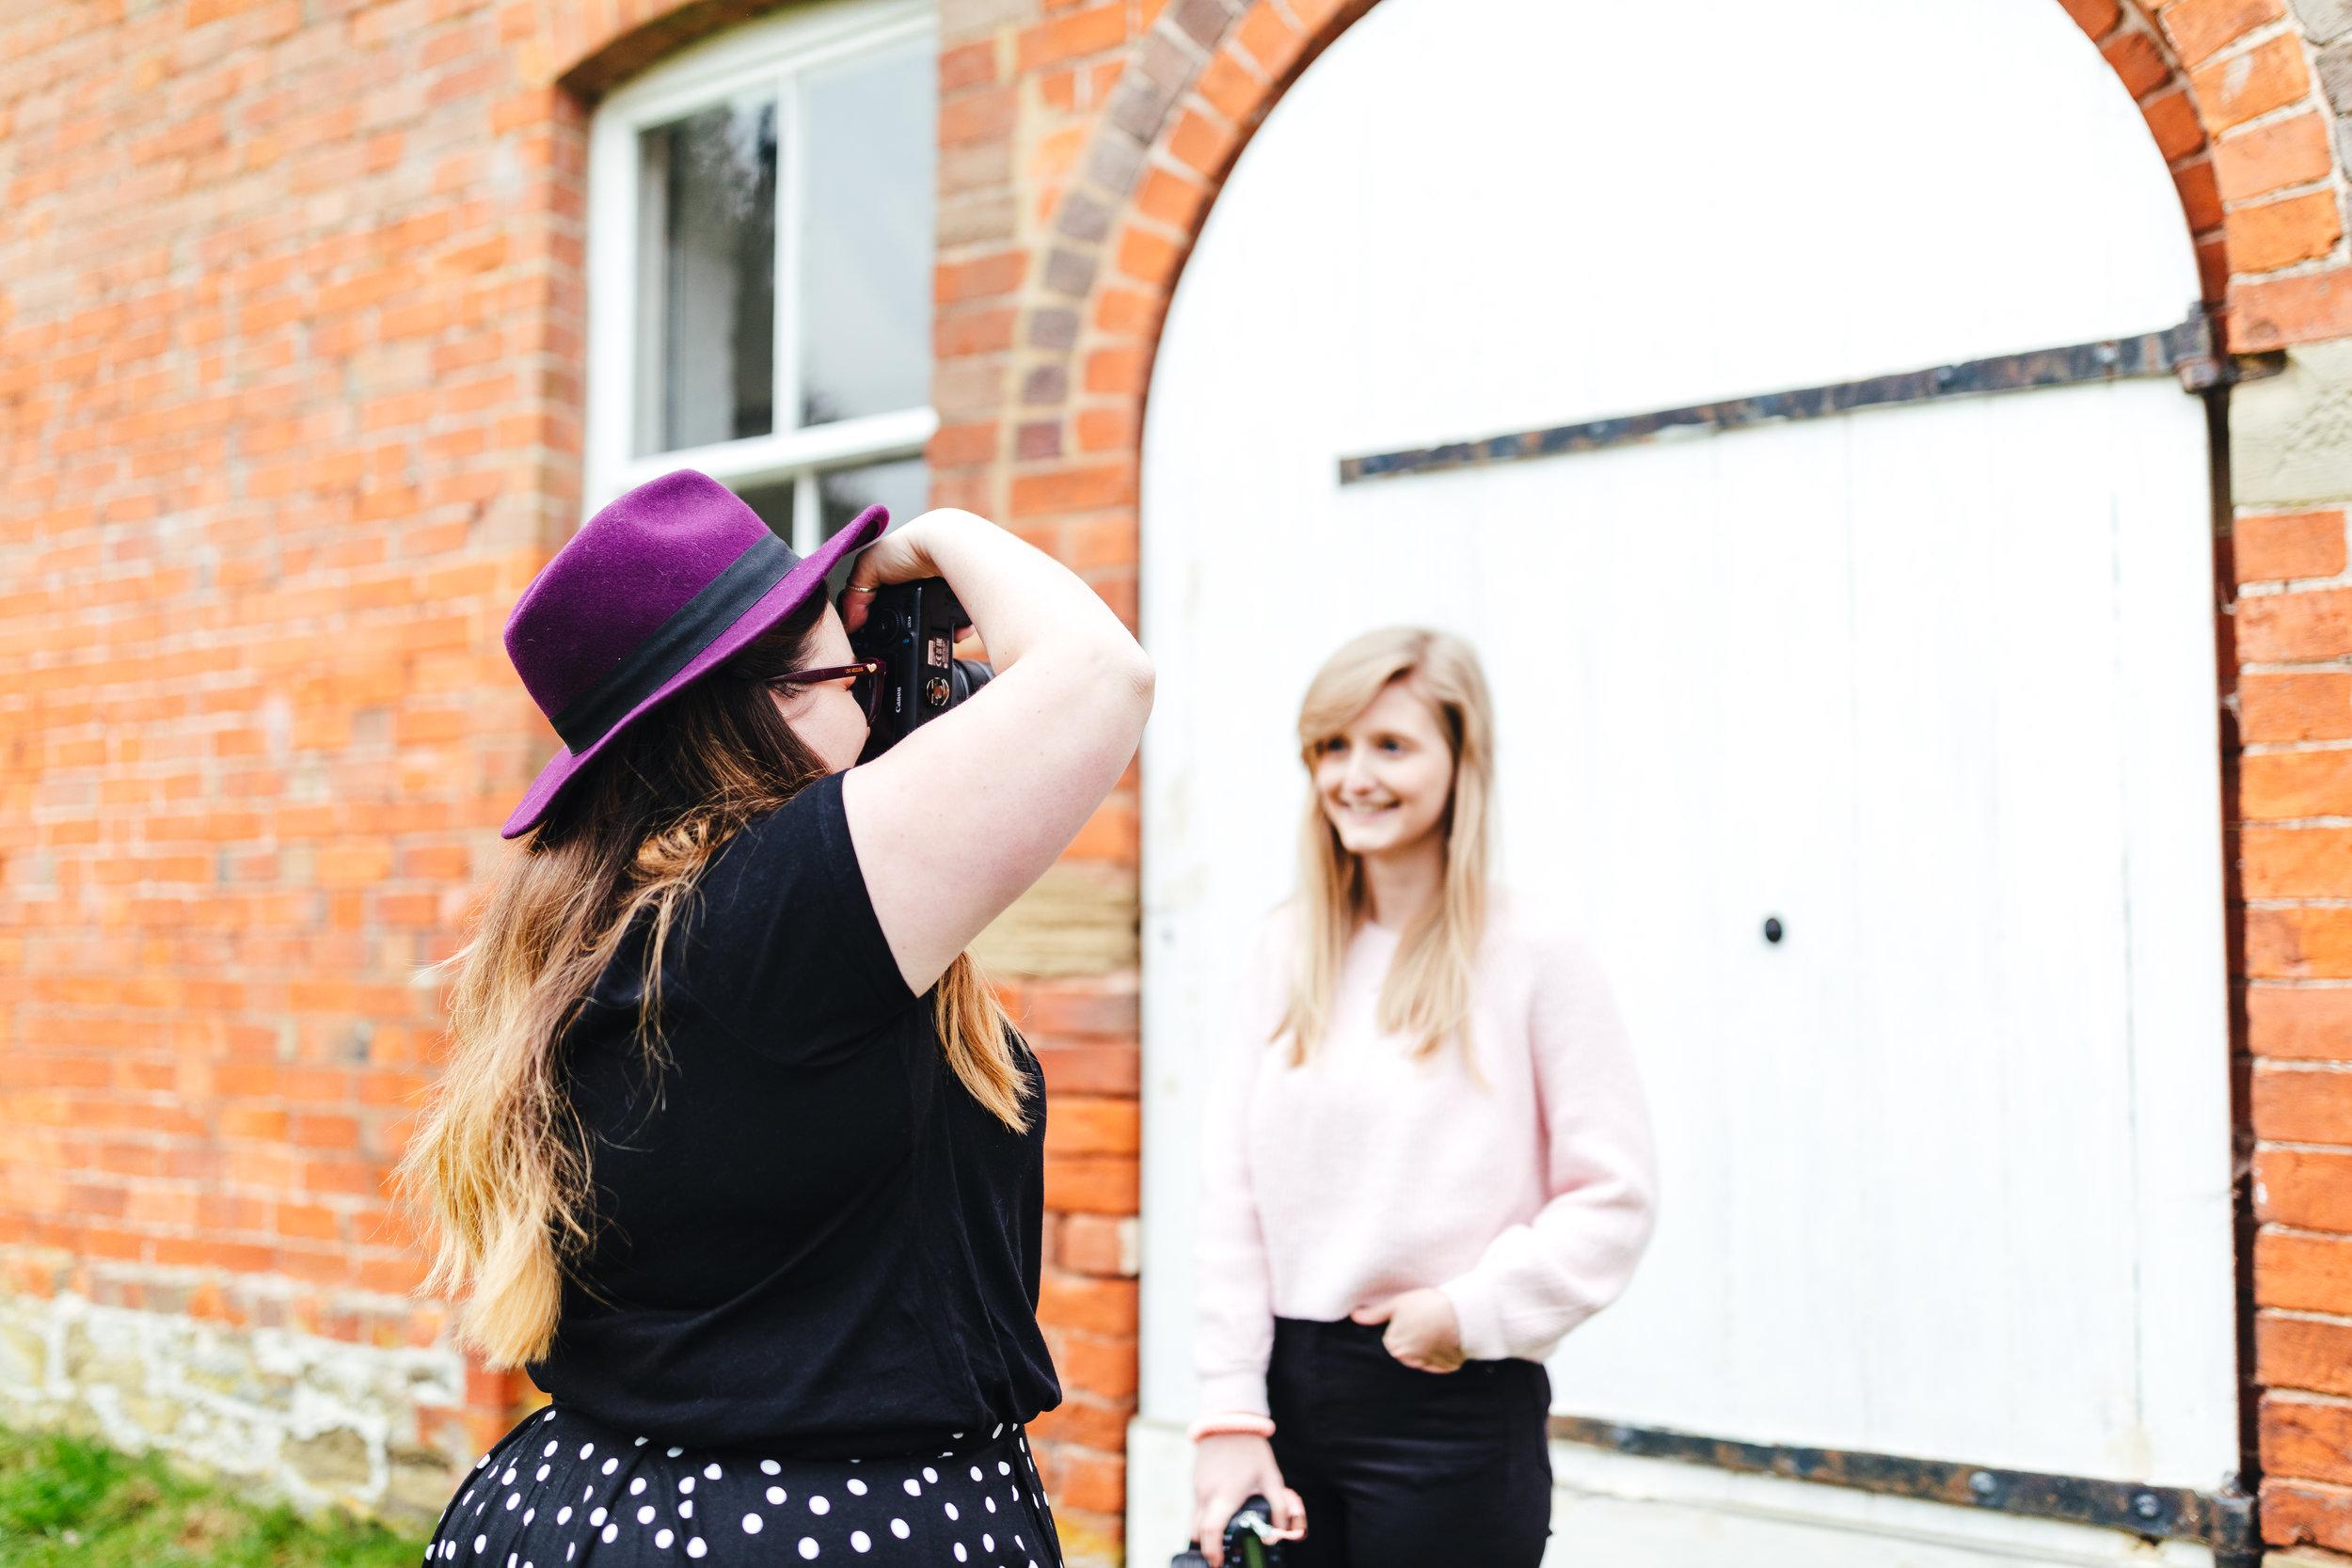 Chloe Lee Photo Fun Colourful Wedding Photography London Essex